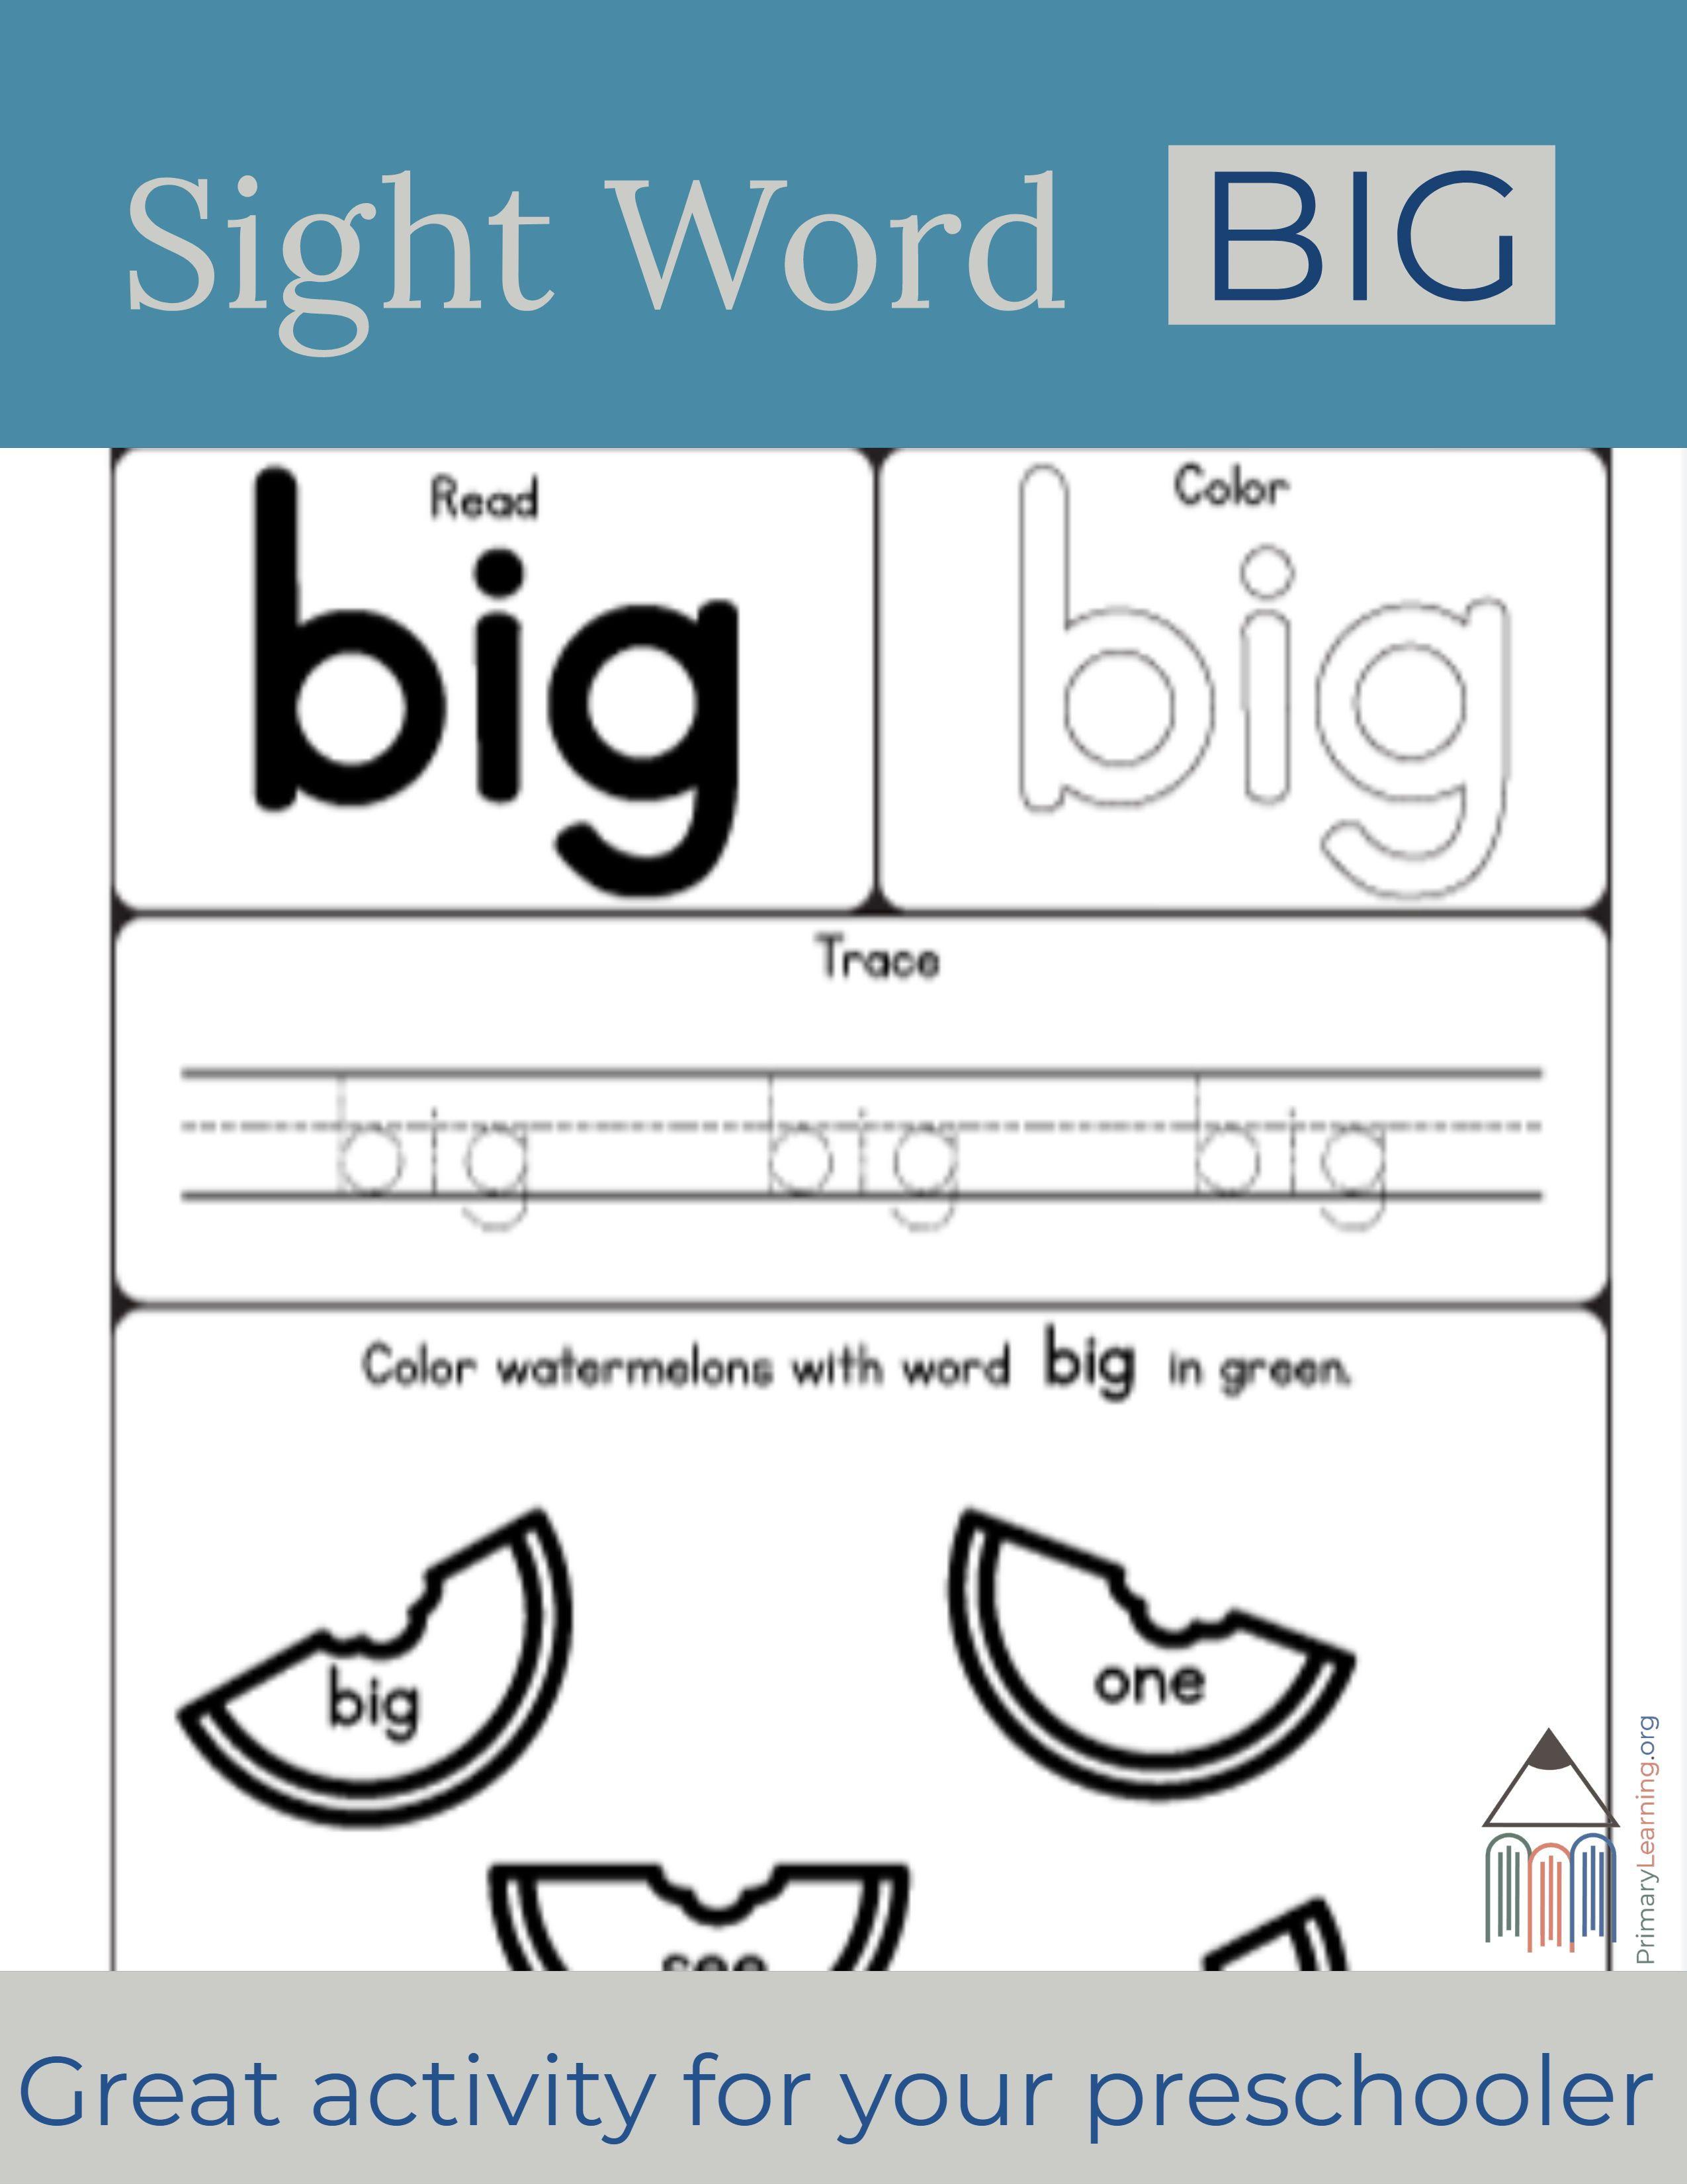 Sight Word Big Worksheet